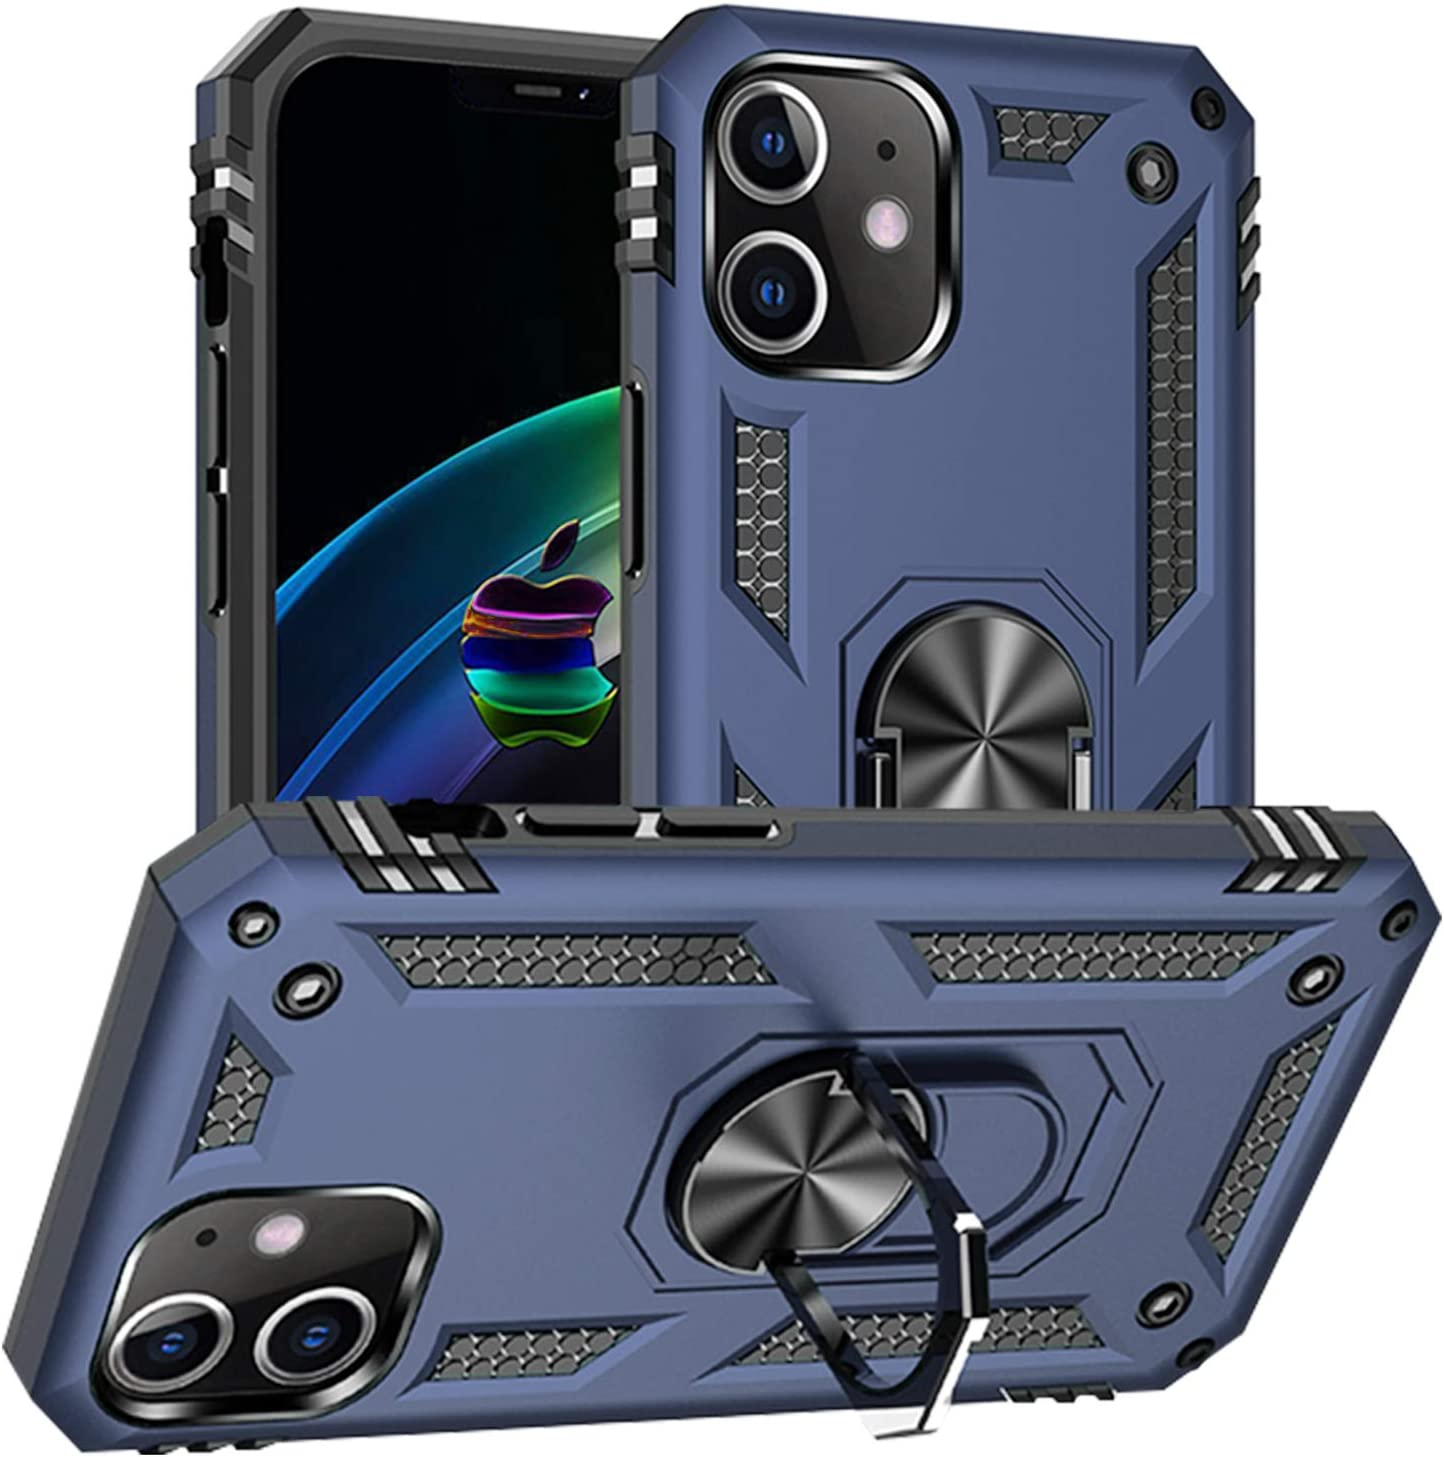 Pegoo Custodia iPhone 12 Mini,Silicone Cover Armatura Antiurto Copertura Cassa Custodia per Apple iPhone 12 Mini (5.4) (Blu scuro)